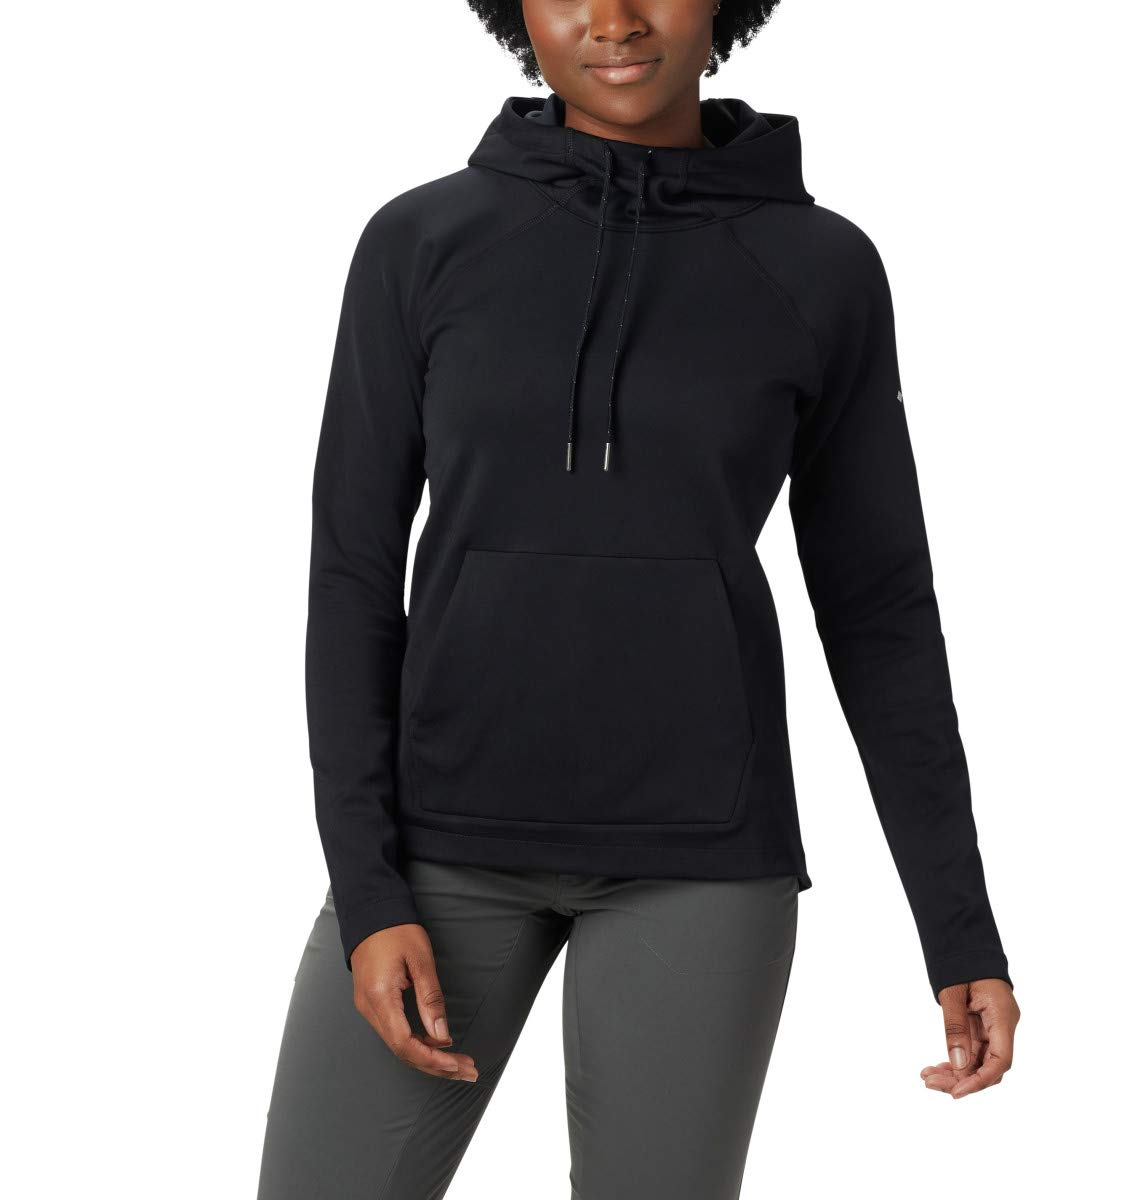 Columbia Women's Bryce Canyon Hoodie, Black, Black Heather, 3X by Columbia